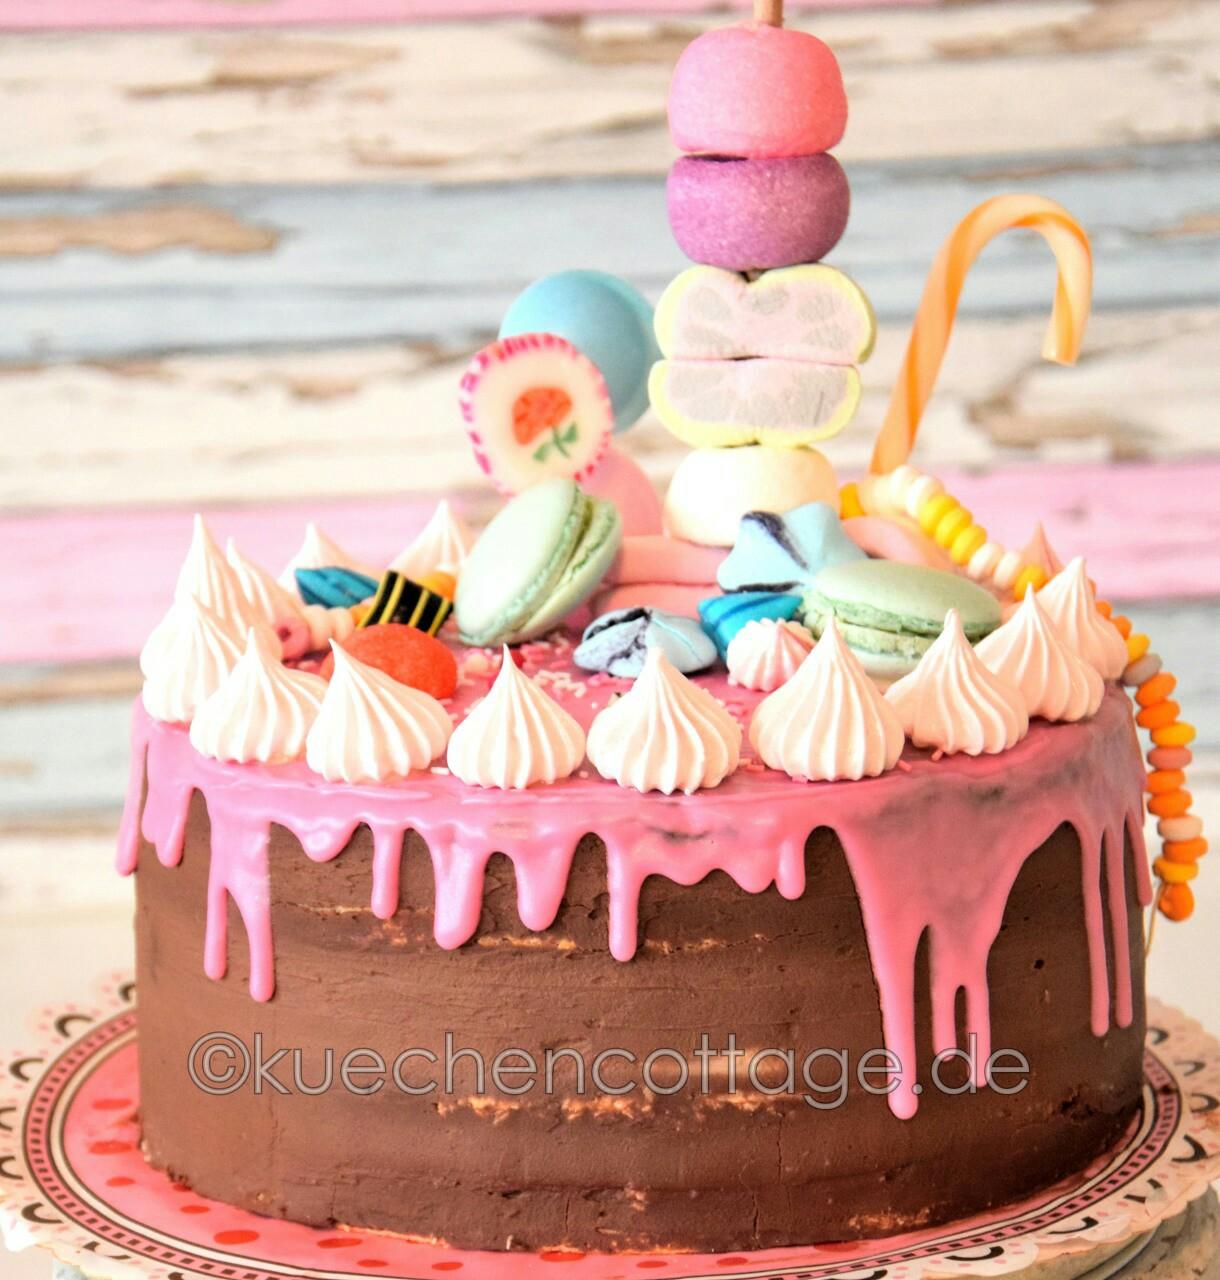 schoko himbeer torte im candy look drip cake k chencottage. Black Bedroom Furniture Sets. Home Design Ideas